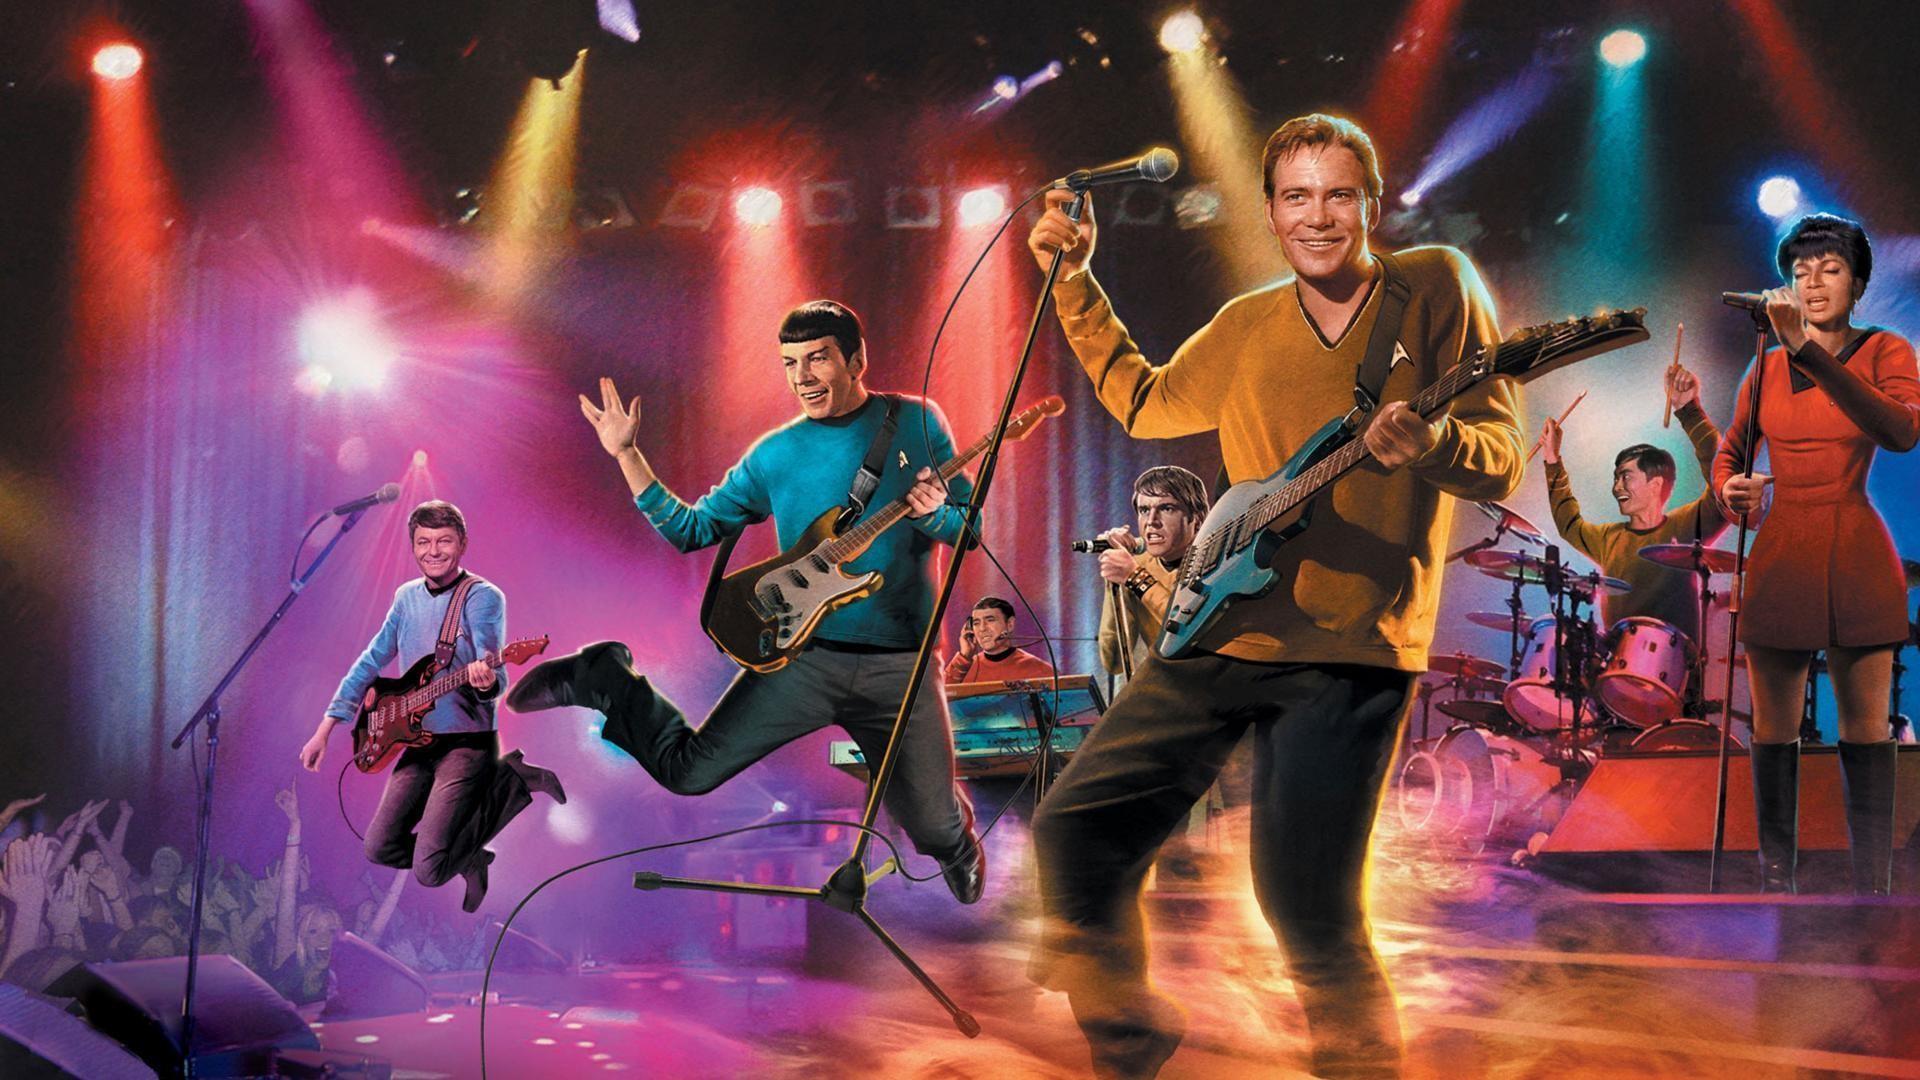 Star Trek Tos Wallpaper 68 Images